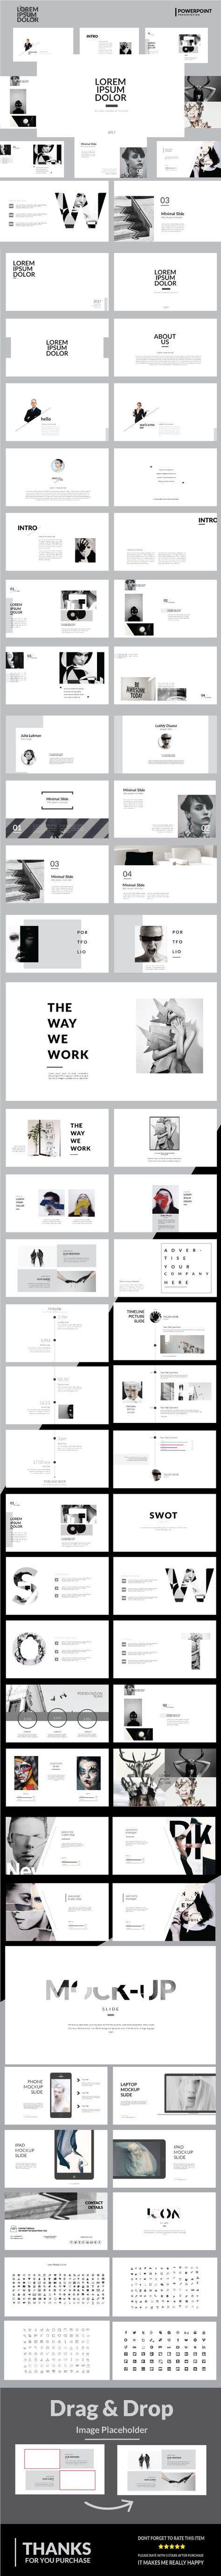 Lorem Ipsum Dolor - Multipurpose Powerpoint Template | Business ...